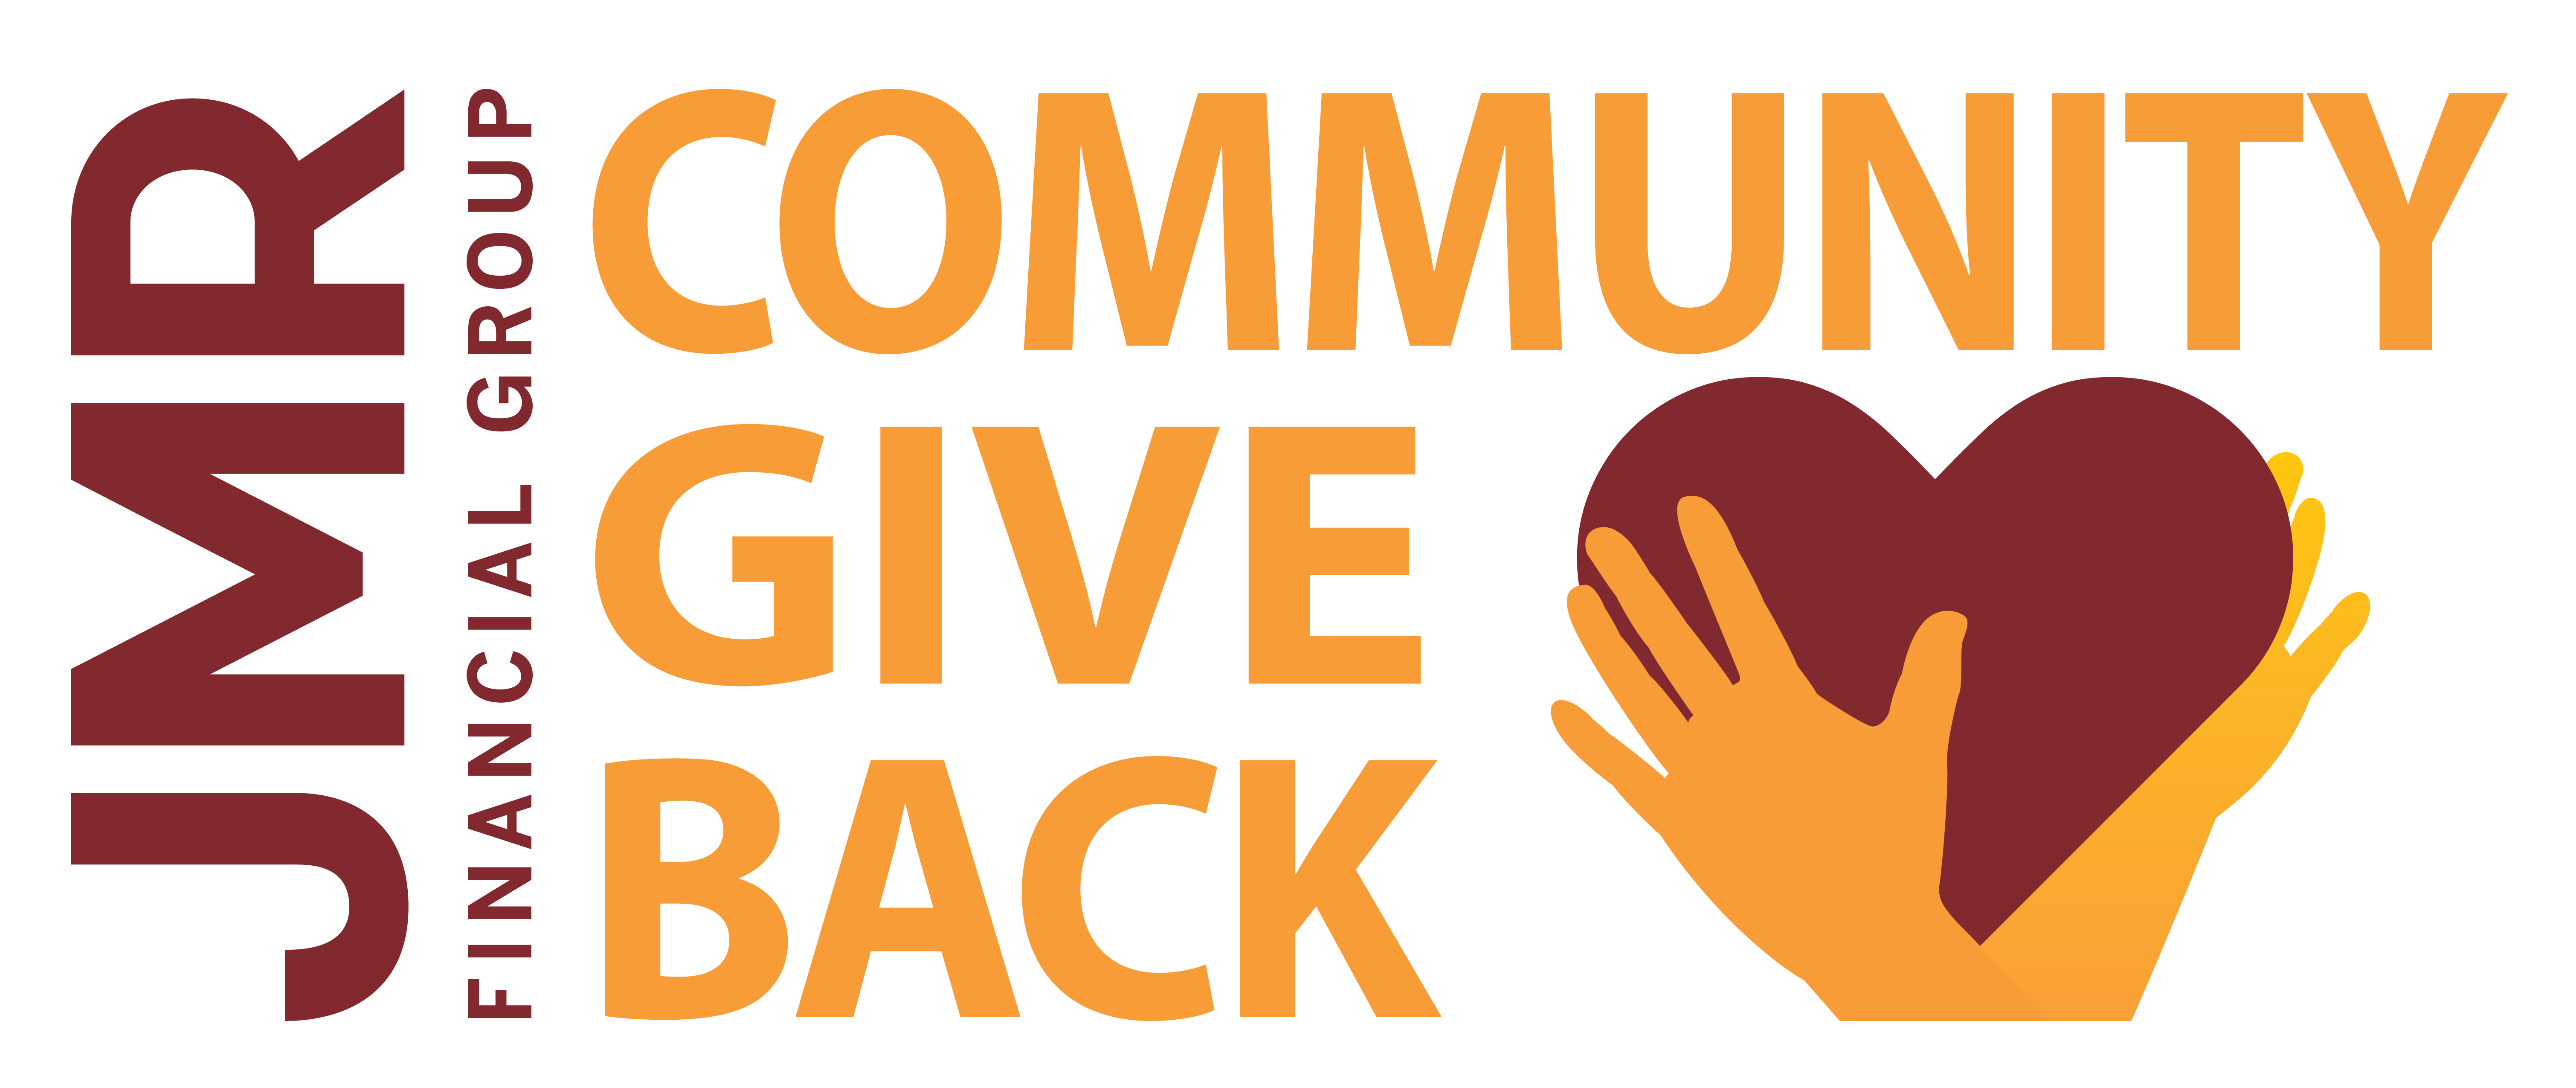 jmr financial group give back to community program logo